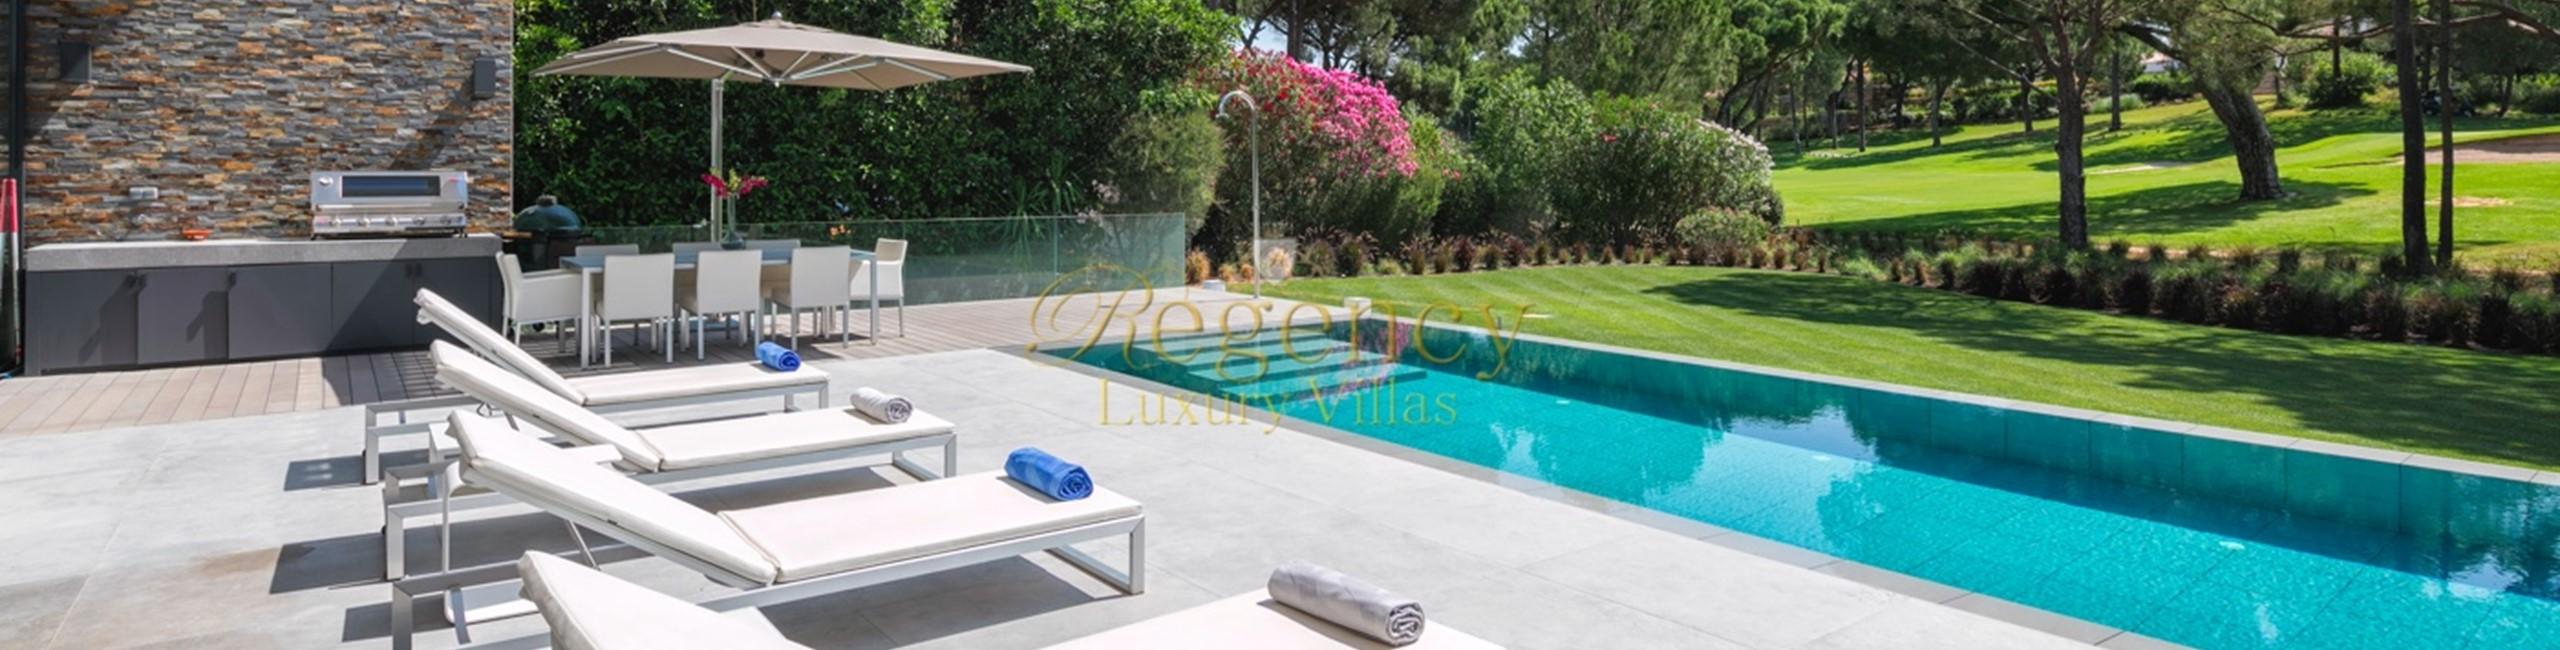 Villas To Rent In The Quinta Do Lago Resort